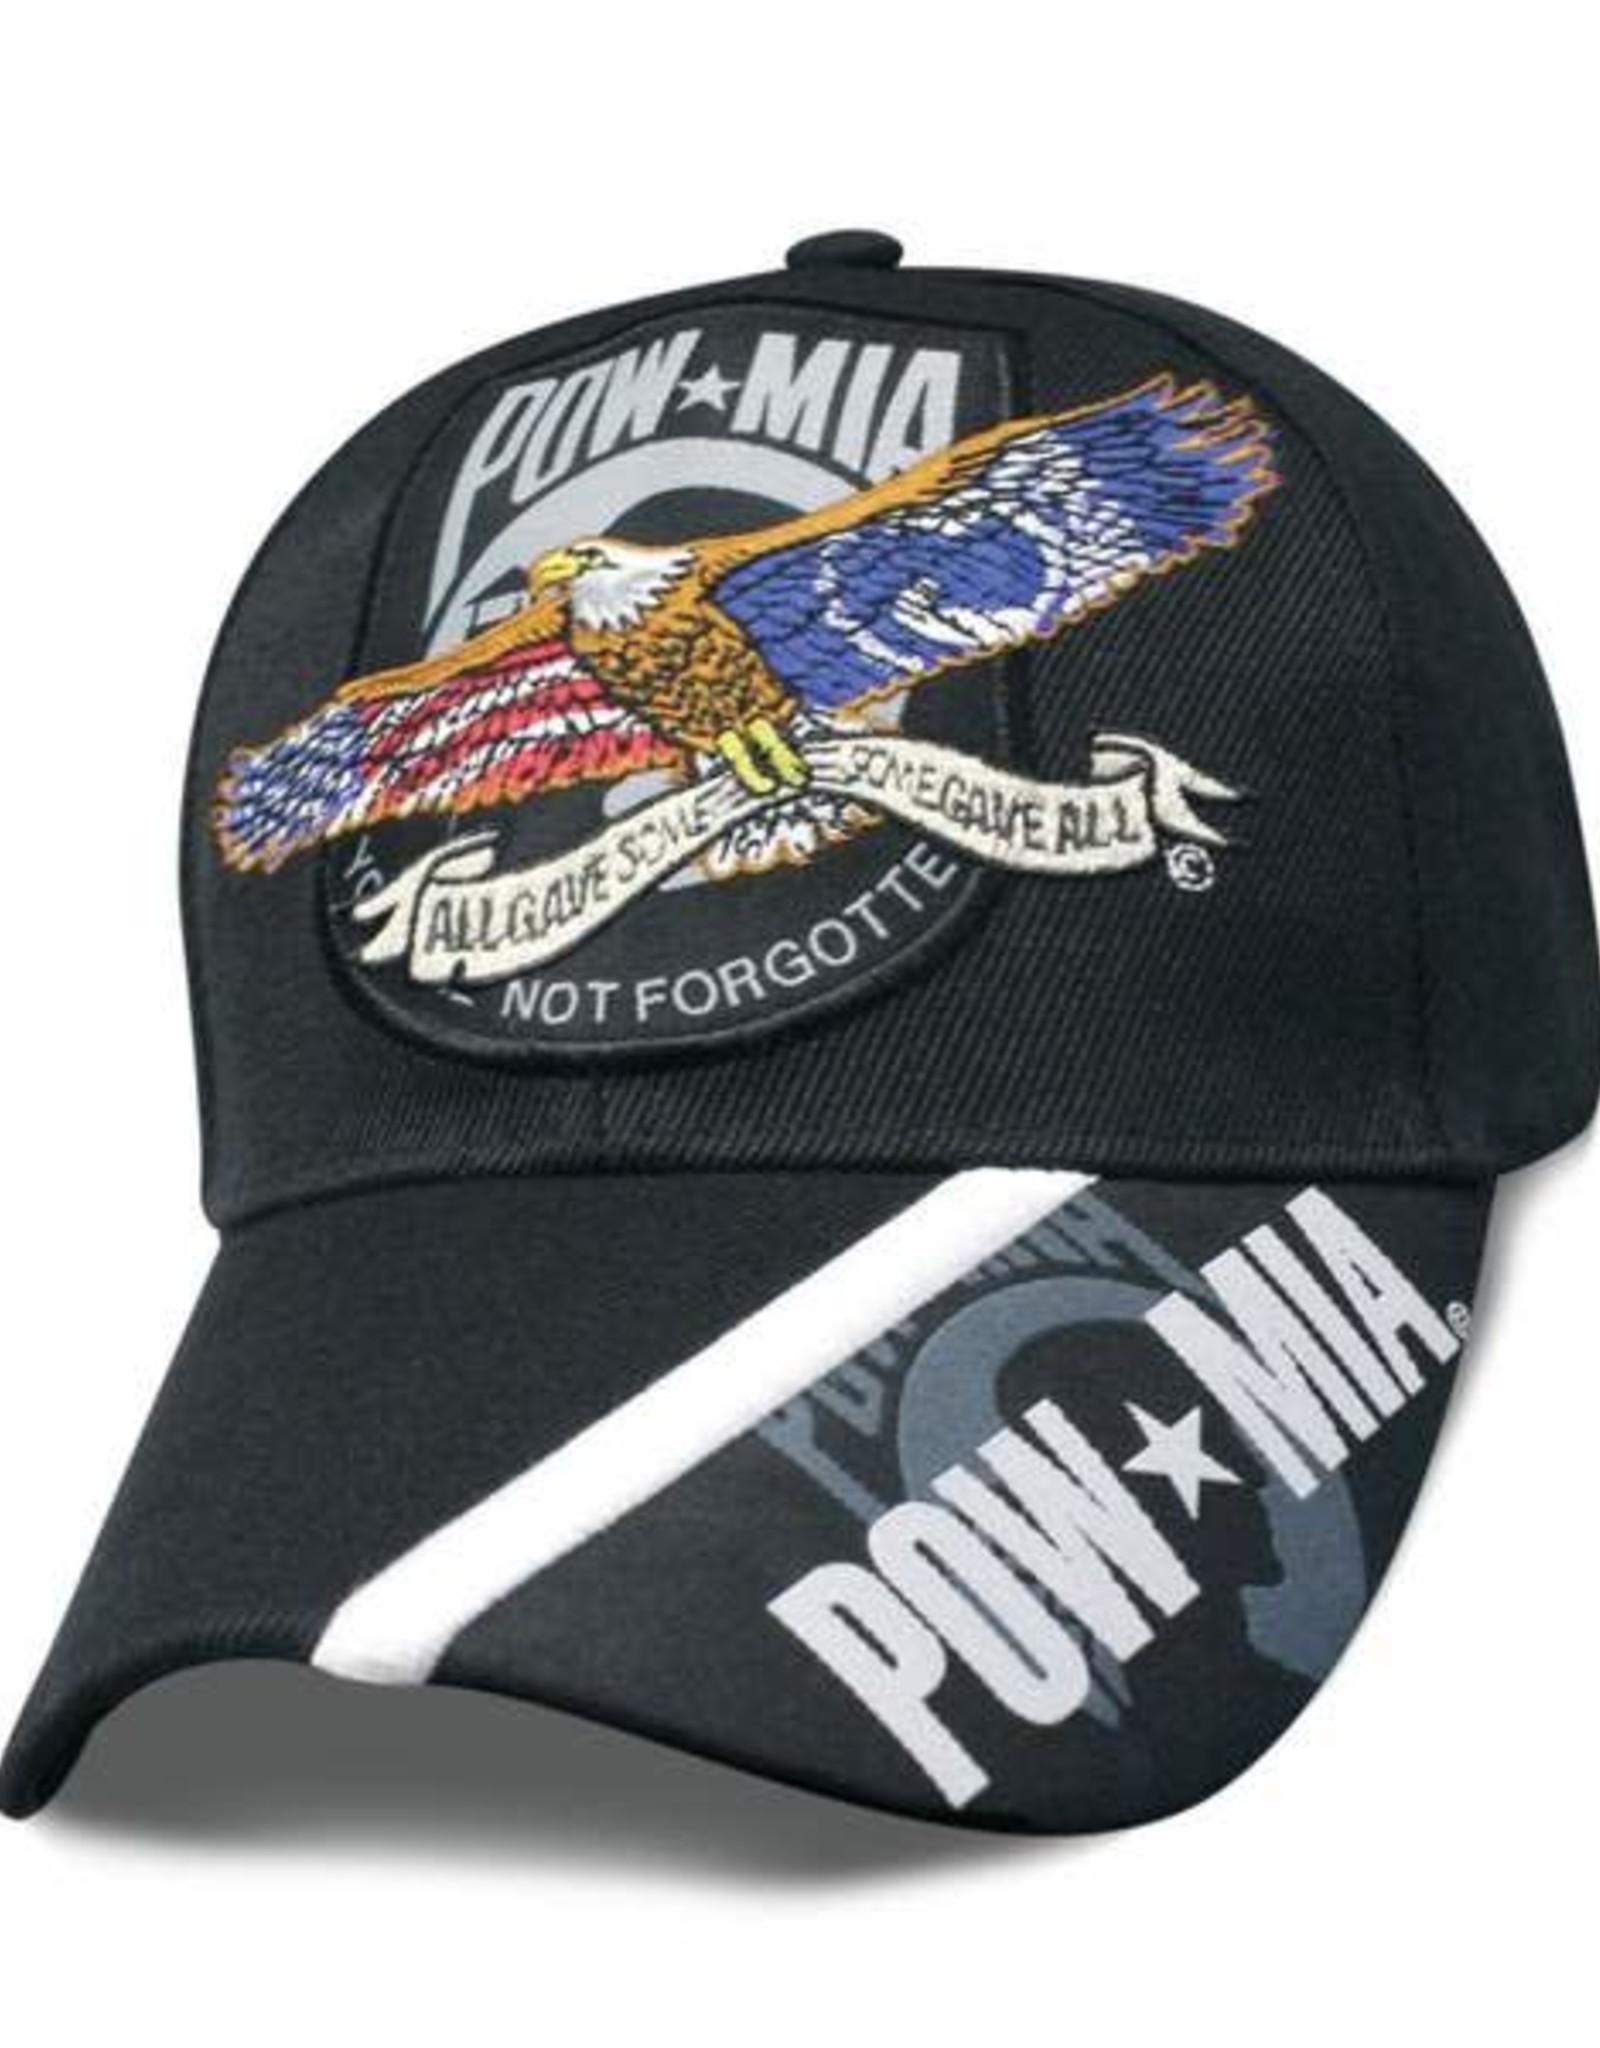 MidMil POW*MIA Hat with Soaring Eagle and POW#MIA on Bill Black